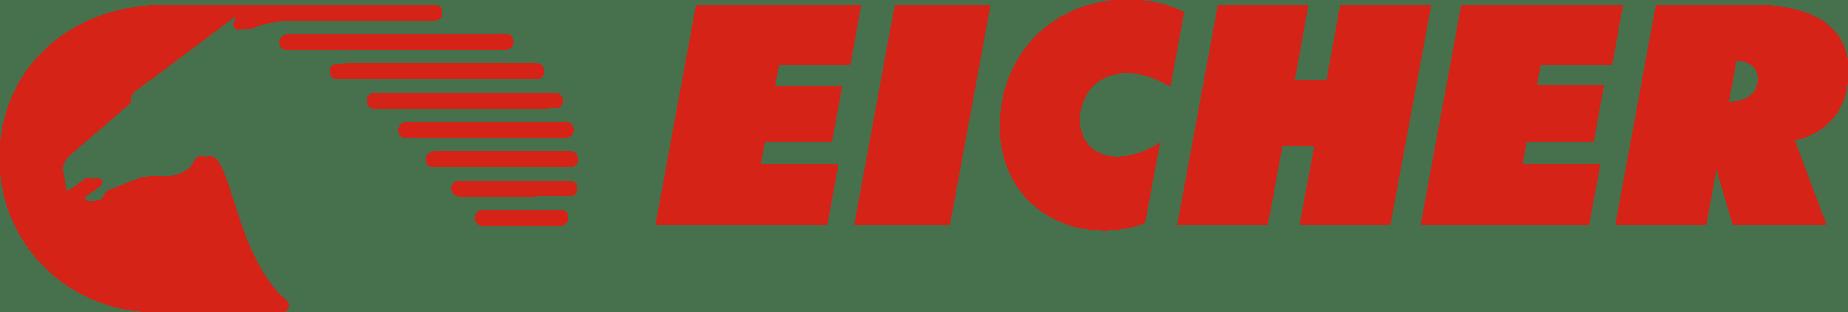 Eicher Motors Logo png